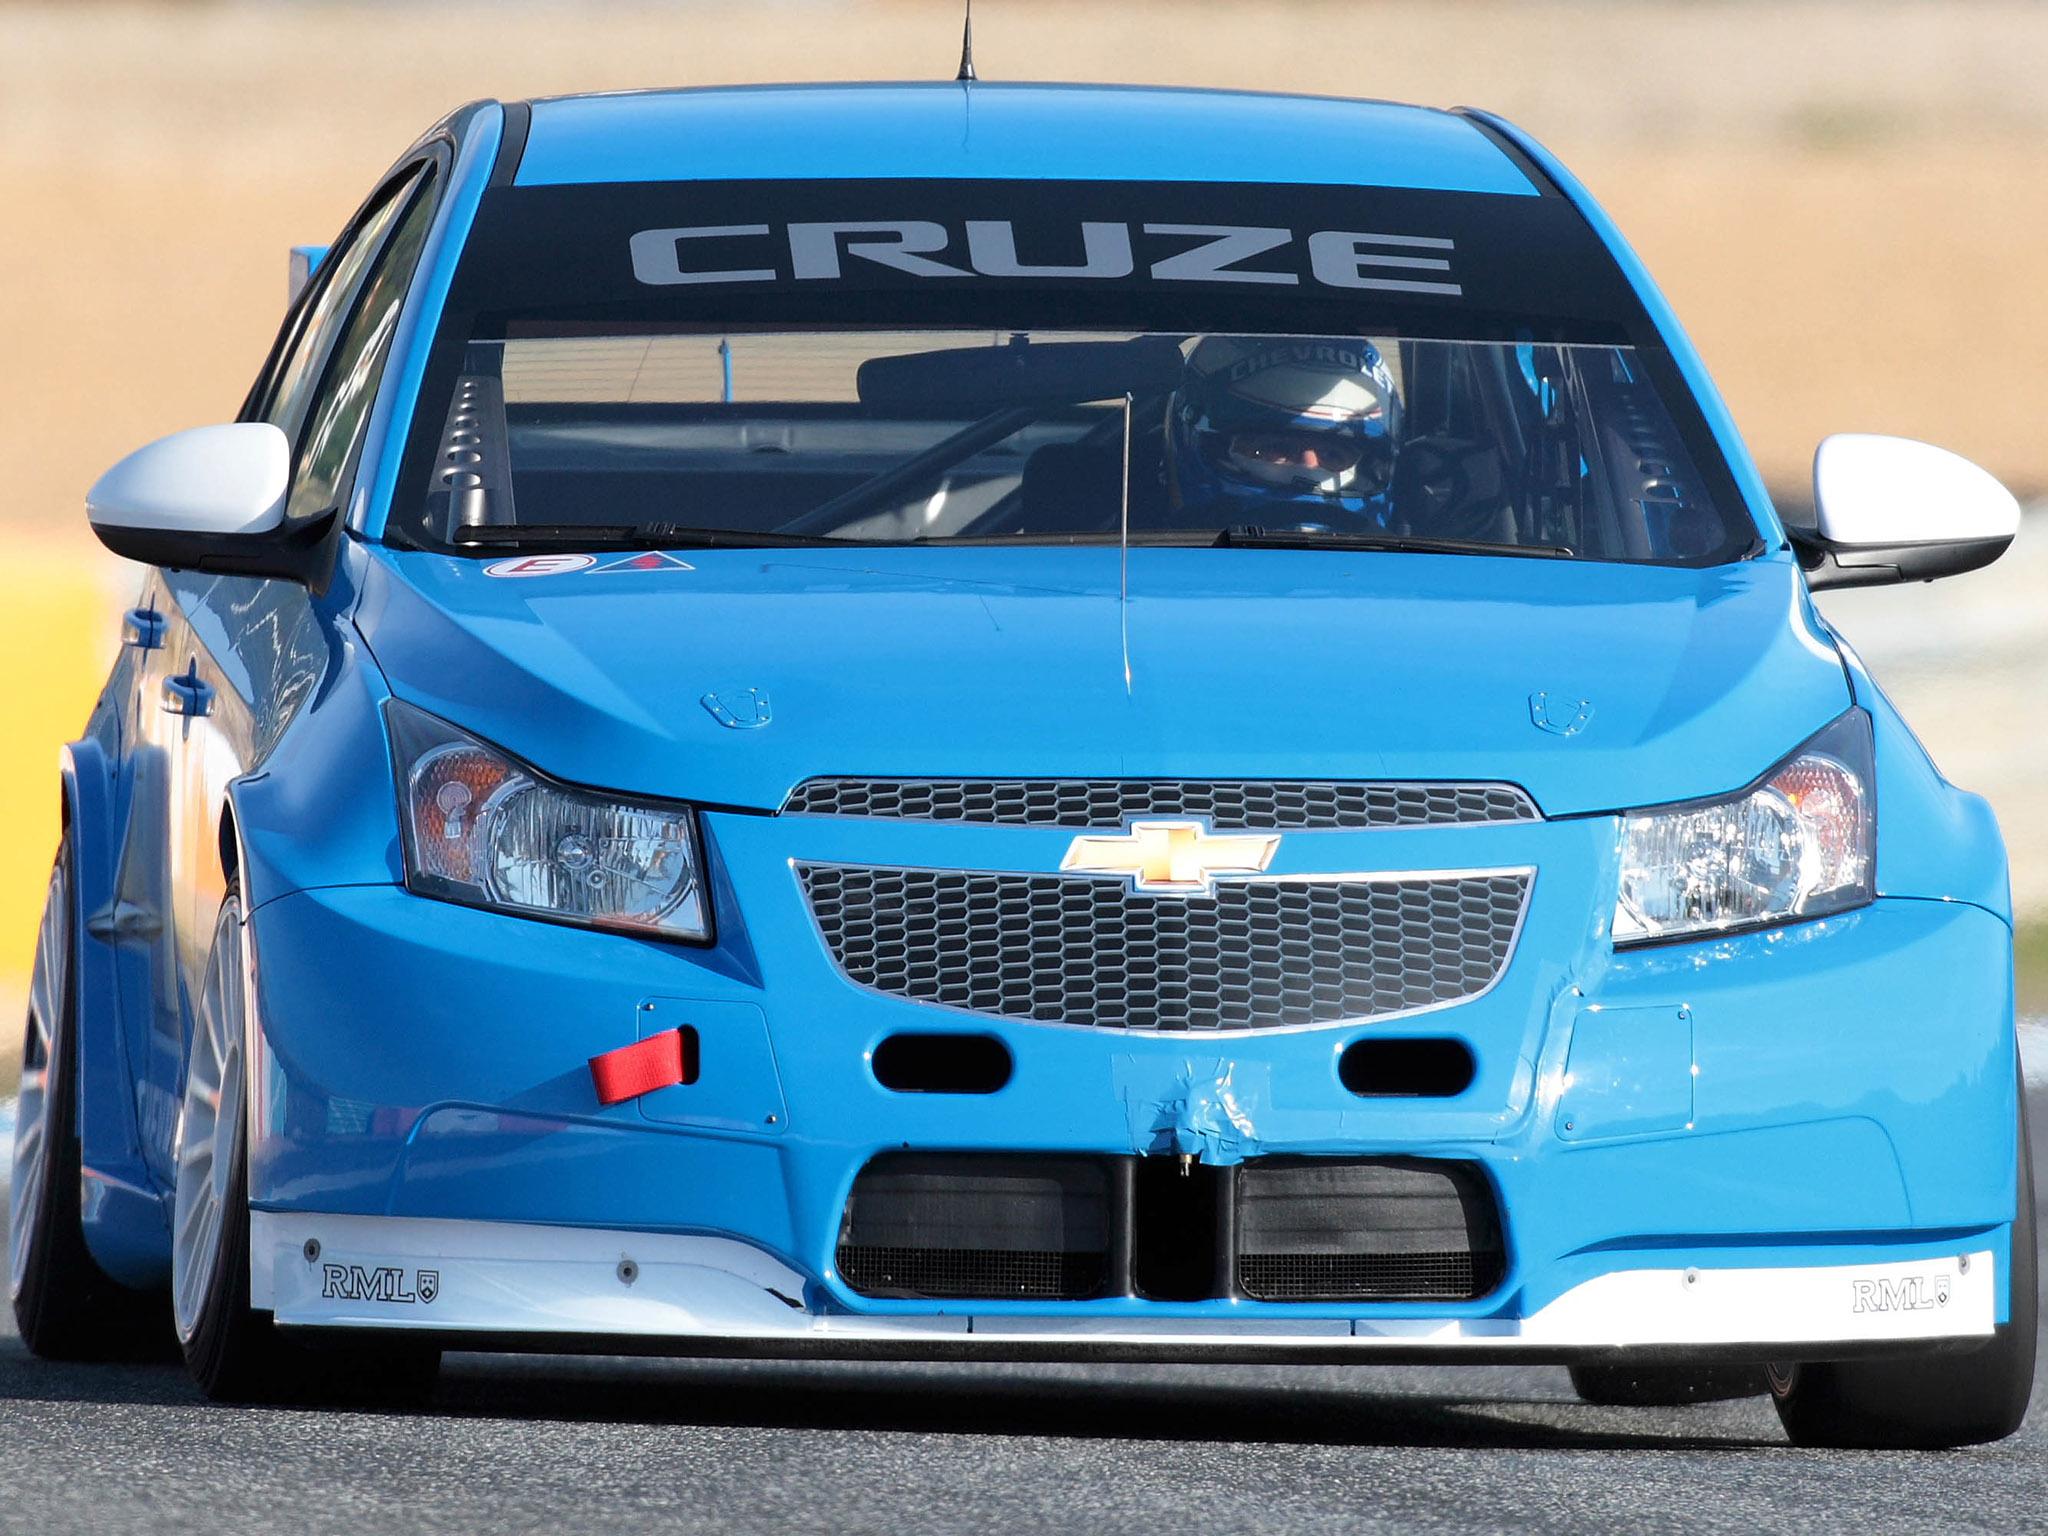 Cruze Wtcc Wallpaper 2011 Chevrolet Cruze Wtcc Race